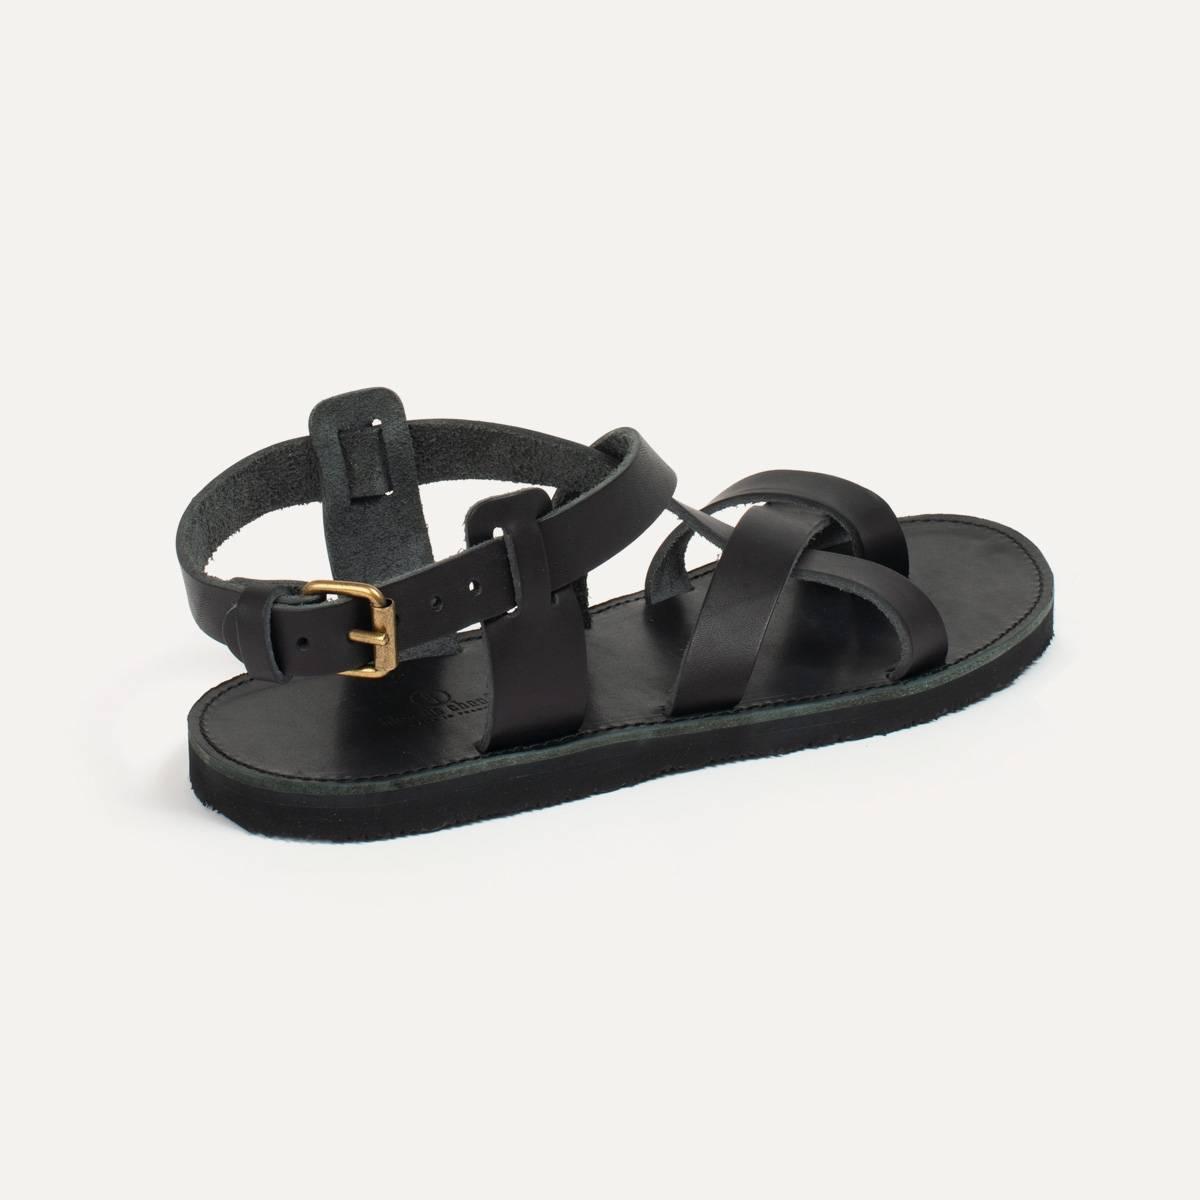 Lhassa leather sandals - Black (image n°3)